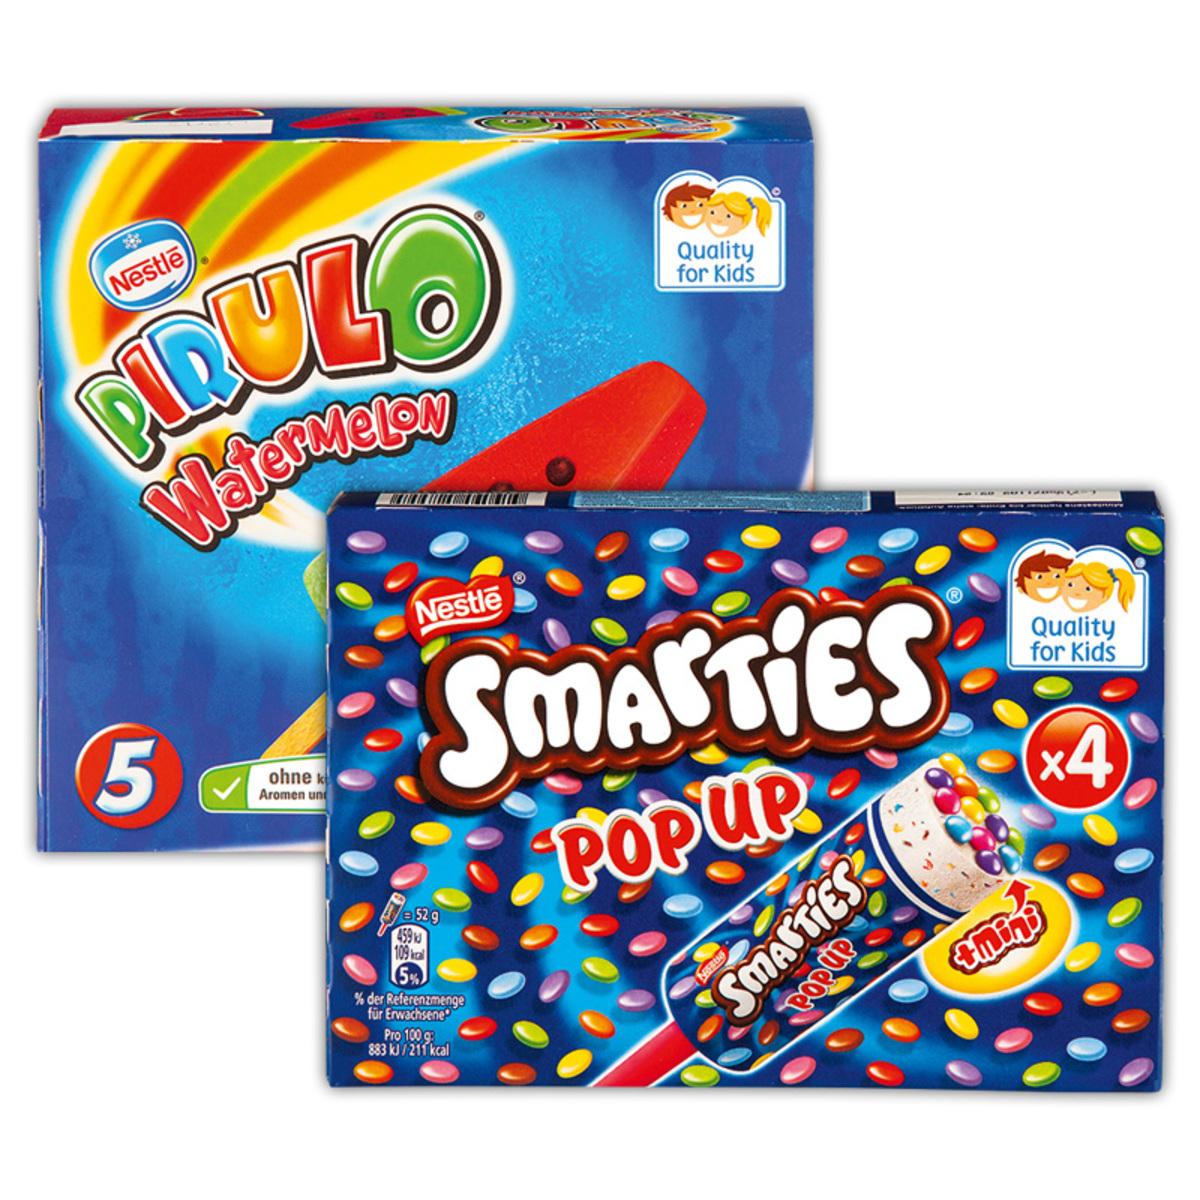 Bild 1 von Nestlé Smarties Pop Up / Pirulo Watermelon